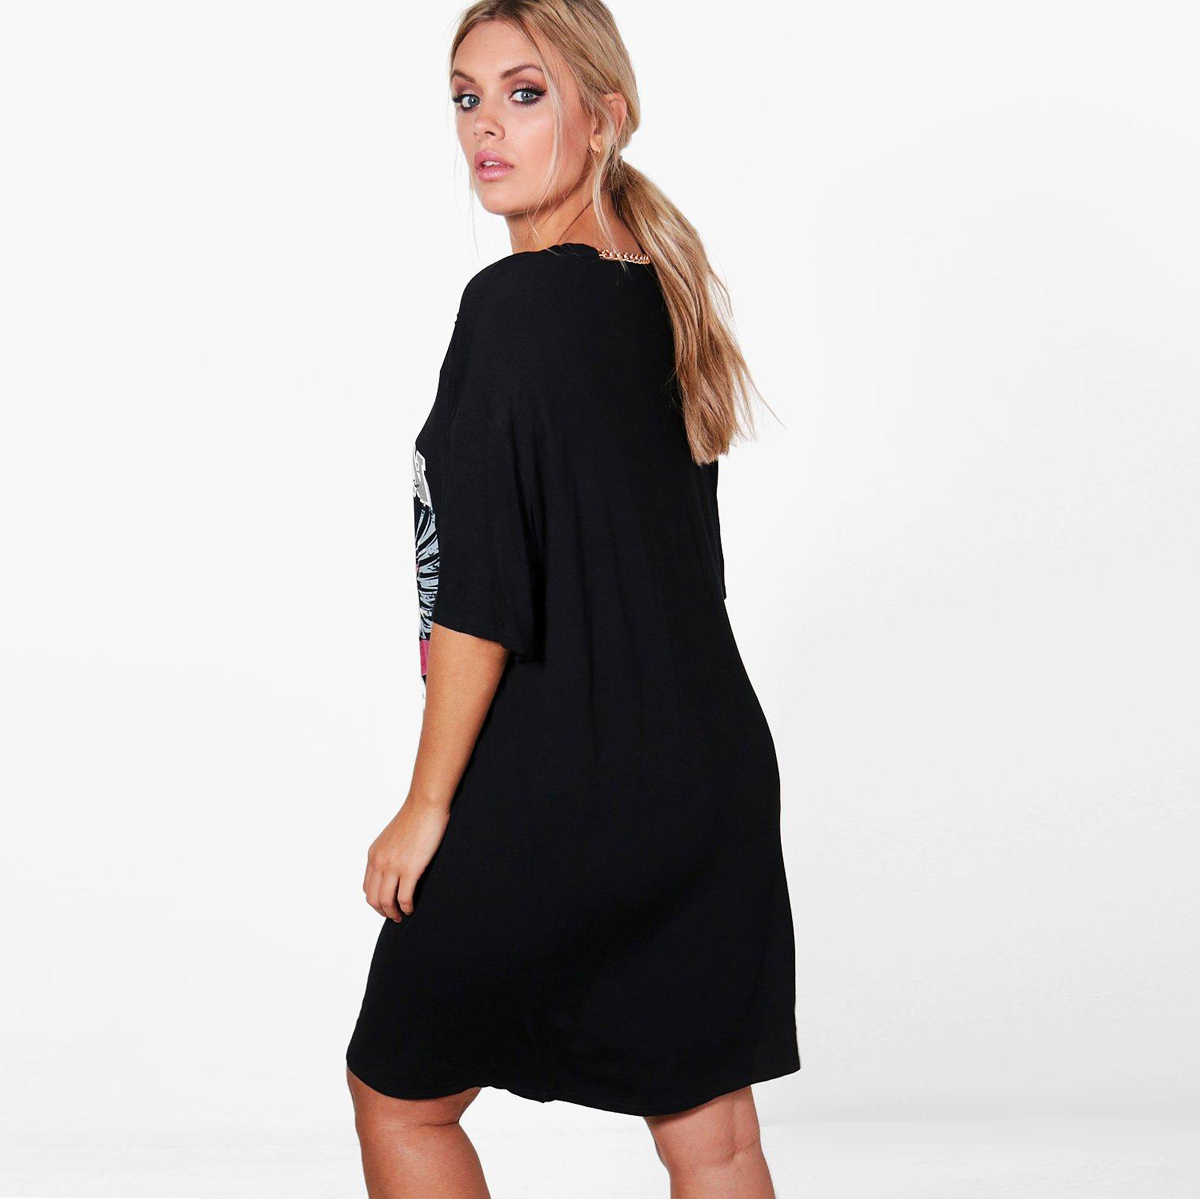 a3f7f0abb0 ... Kissmilk Plus Size Women Animal BOSTON Print T-shirt Dress Distressed  Punk Shirt Hollow Out ...